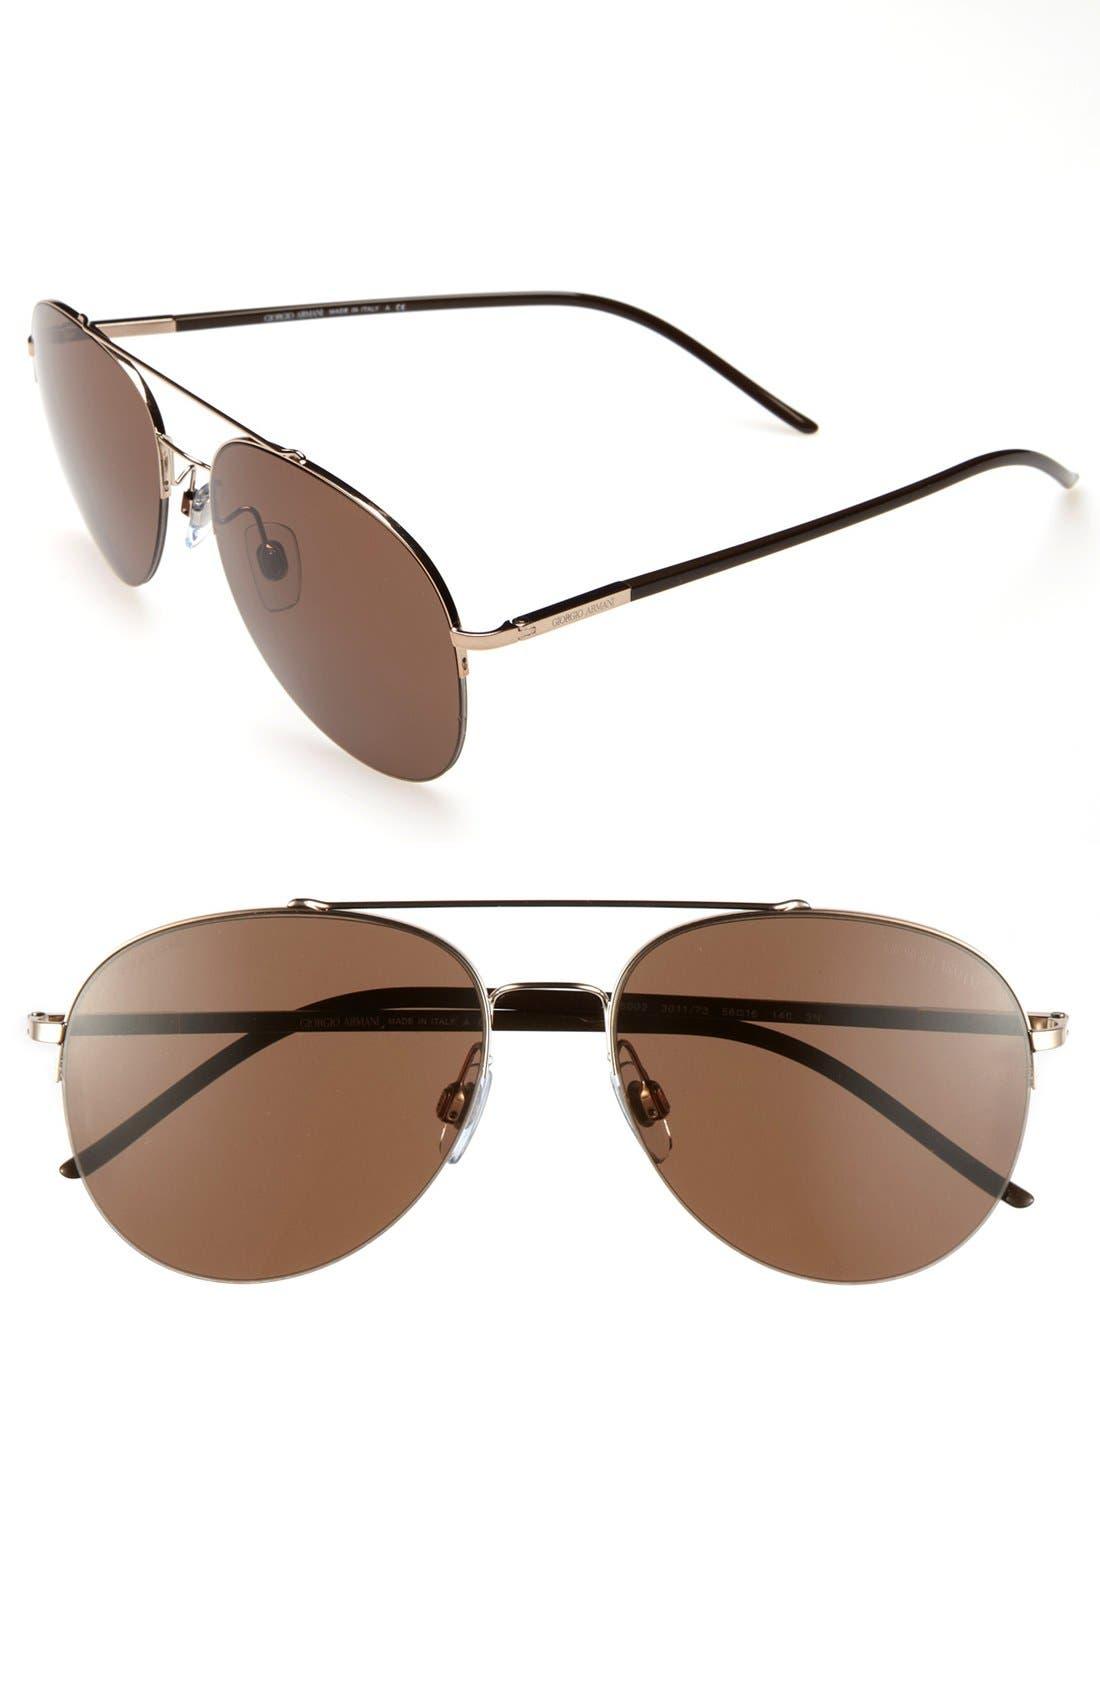 Alternate Image 1 Selected - Giorgio Armani 56mm Aviator Sunglasses